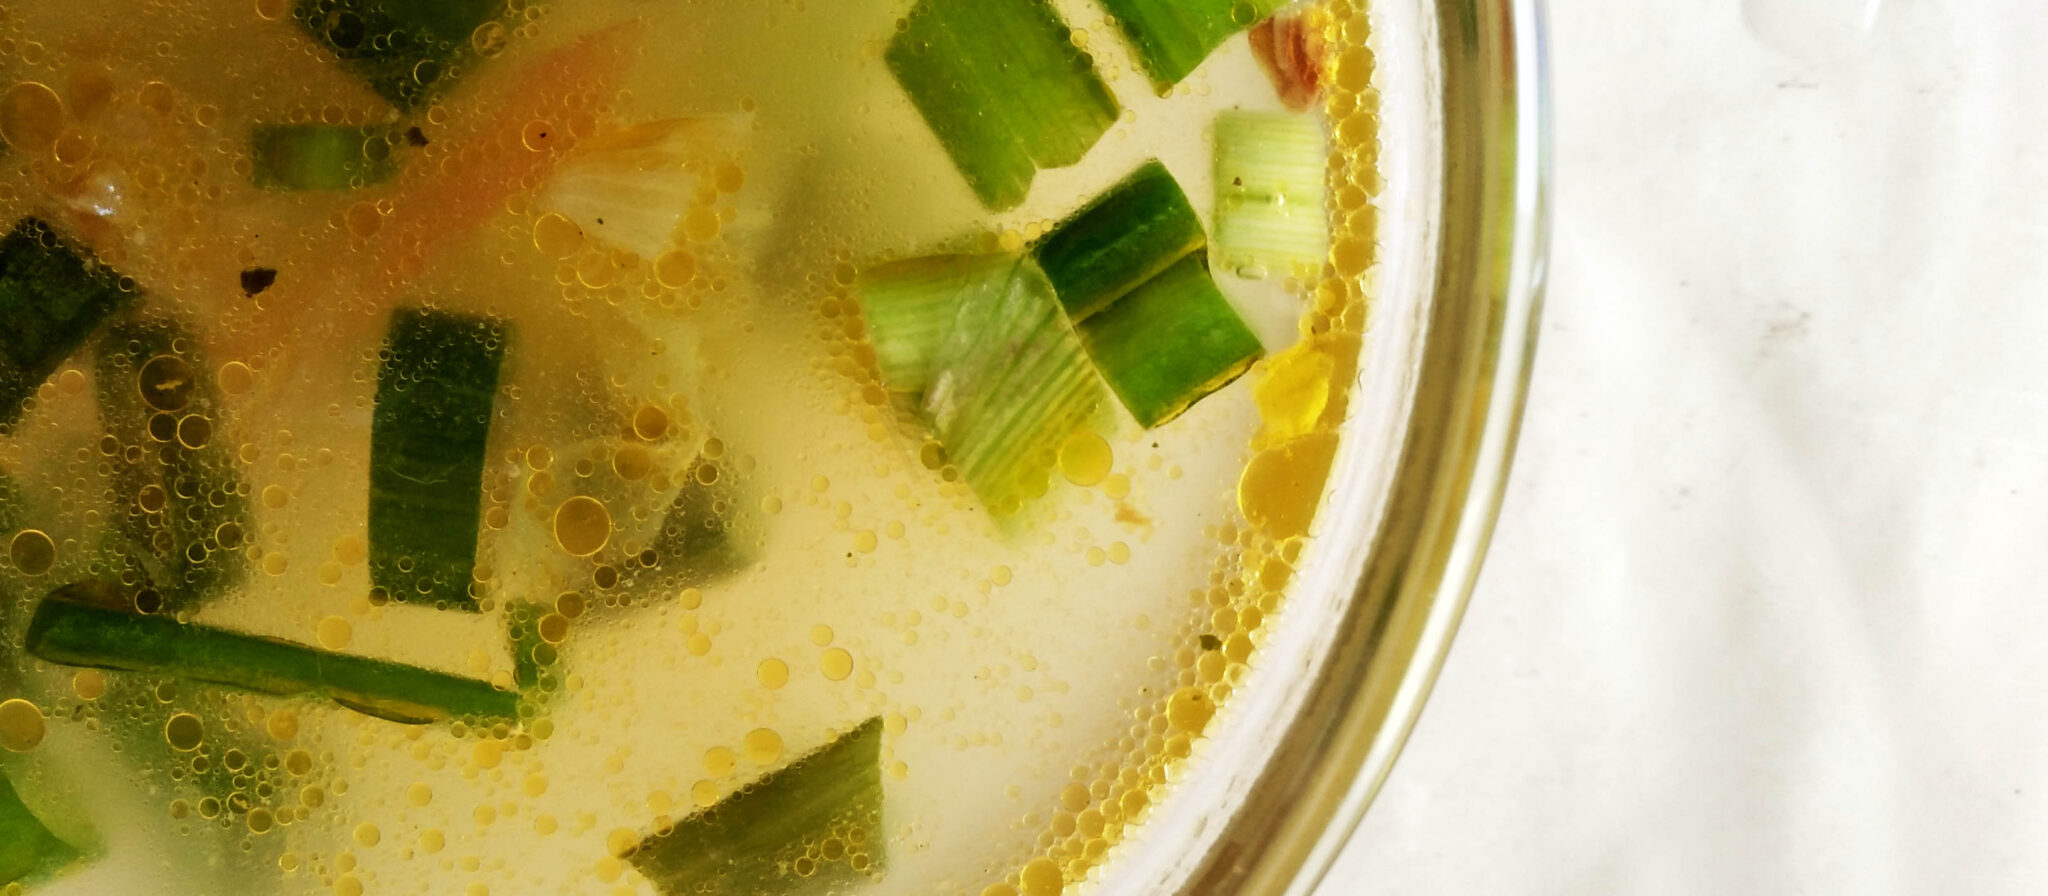 Seaman Memories. Today's Menu: Soup.